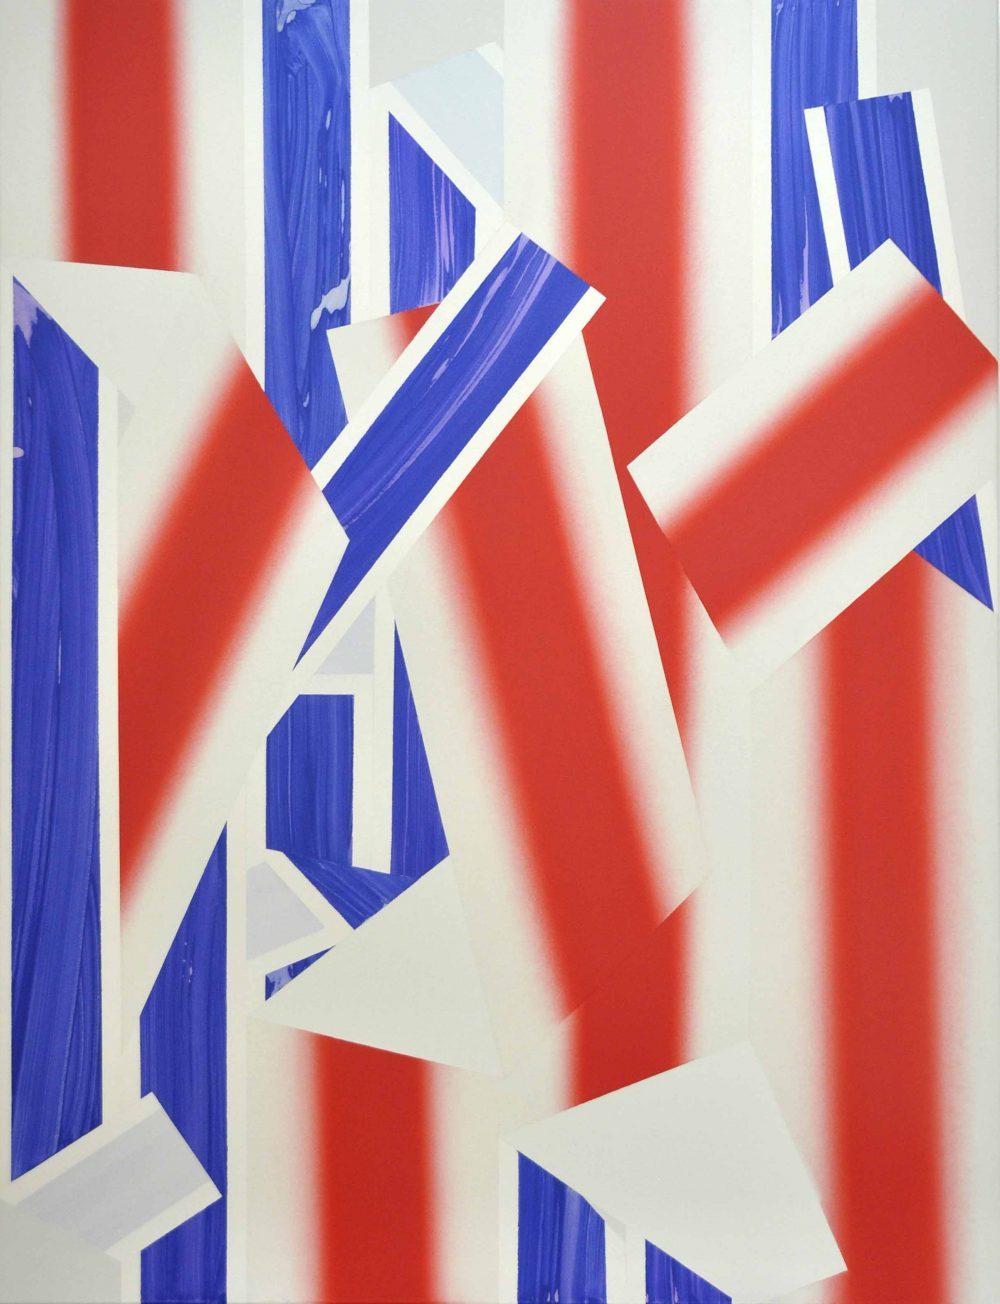 Untitled 221 (2015), Acryl auf Leinwand, 170 x 130 cm